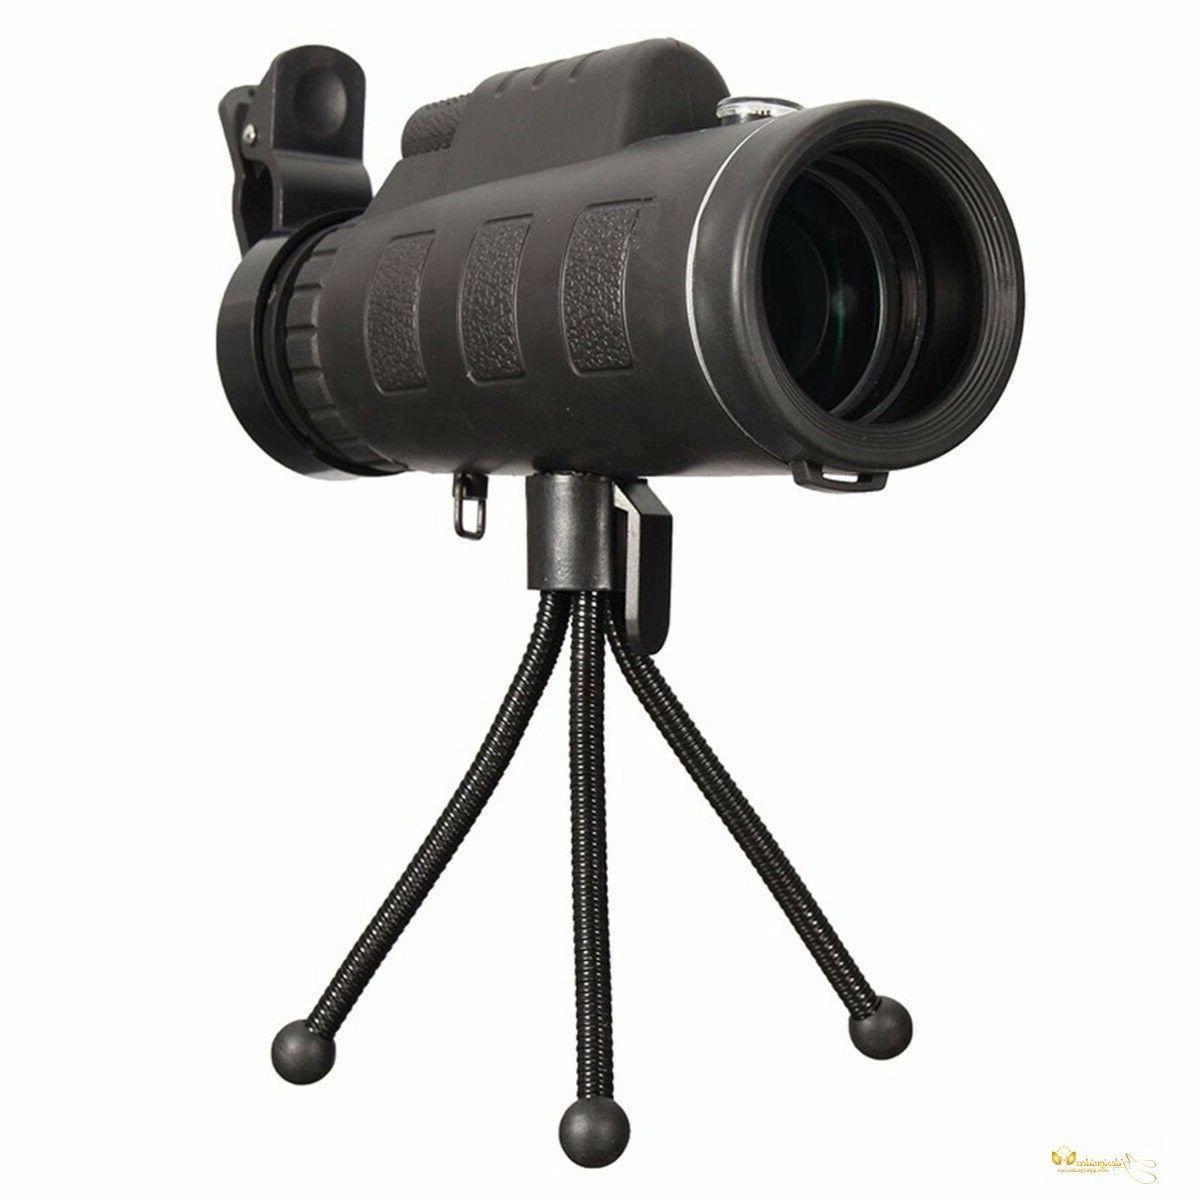 Monocular Dual Focus Telescope Celestron Tripod Handheld Nig